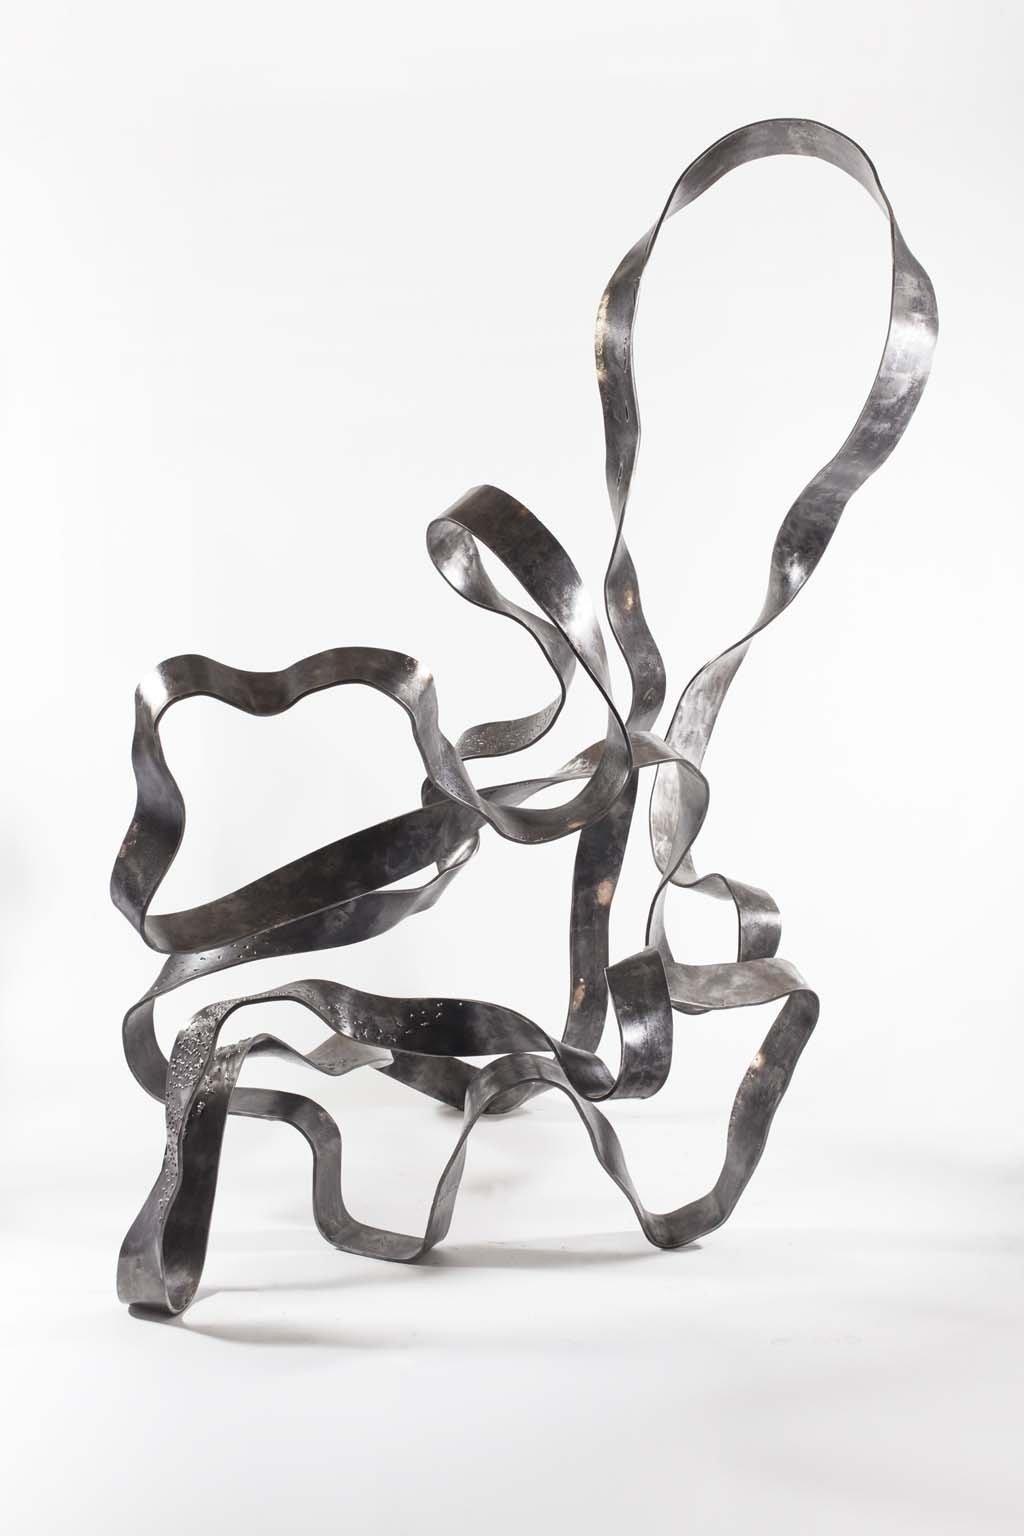 Oblivion VII | 2016 | 208x130x110 cm |  Iron & brass sculpture | Rami Ater | רמי אטר